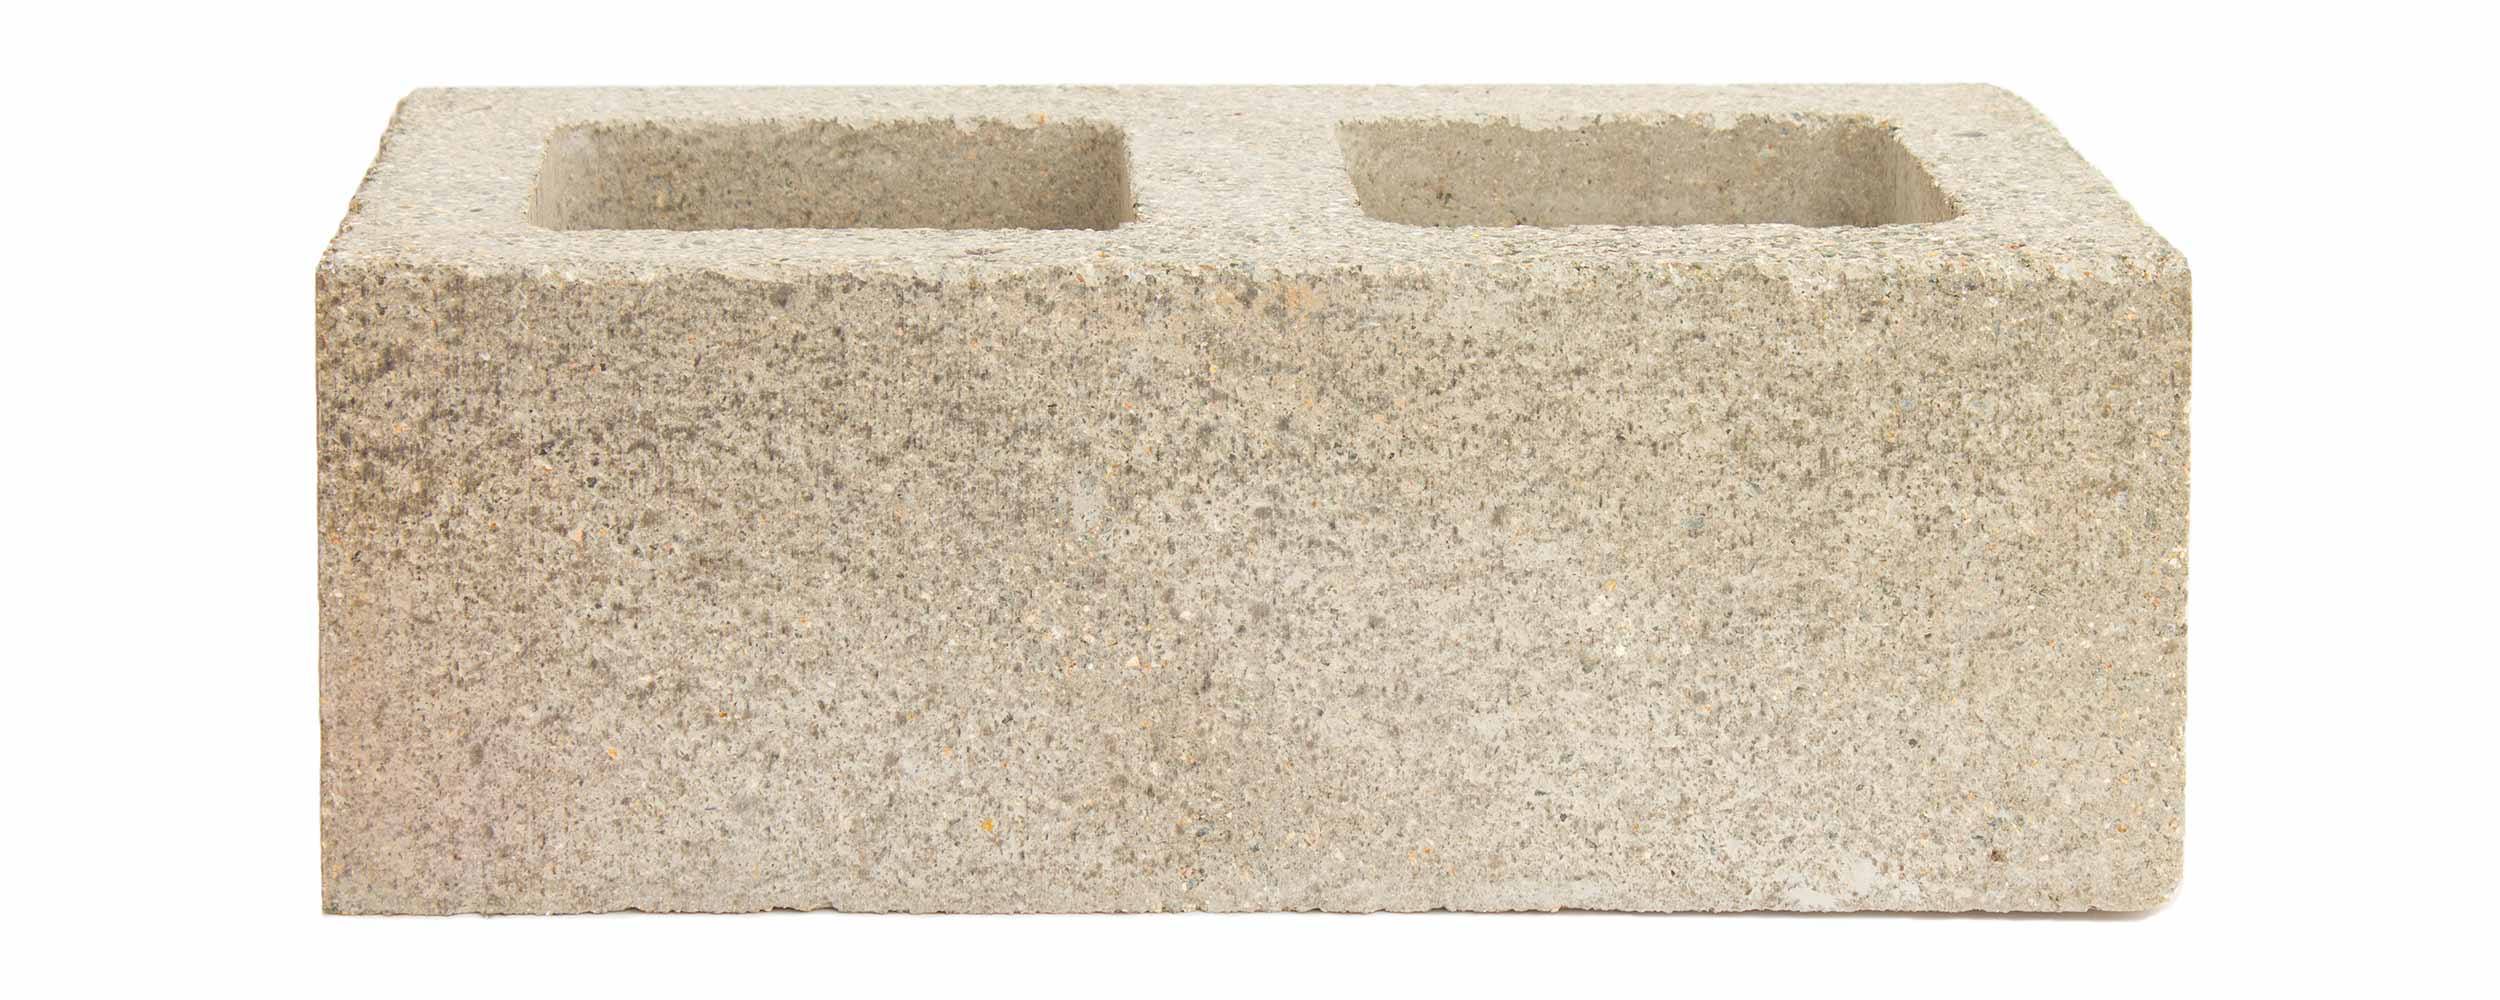 Watershed-Materials-Tan-Watershed-Block-3-2500.jpg